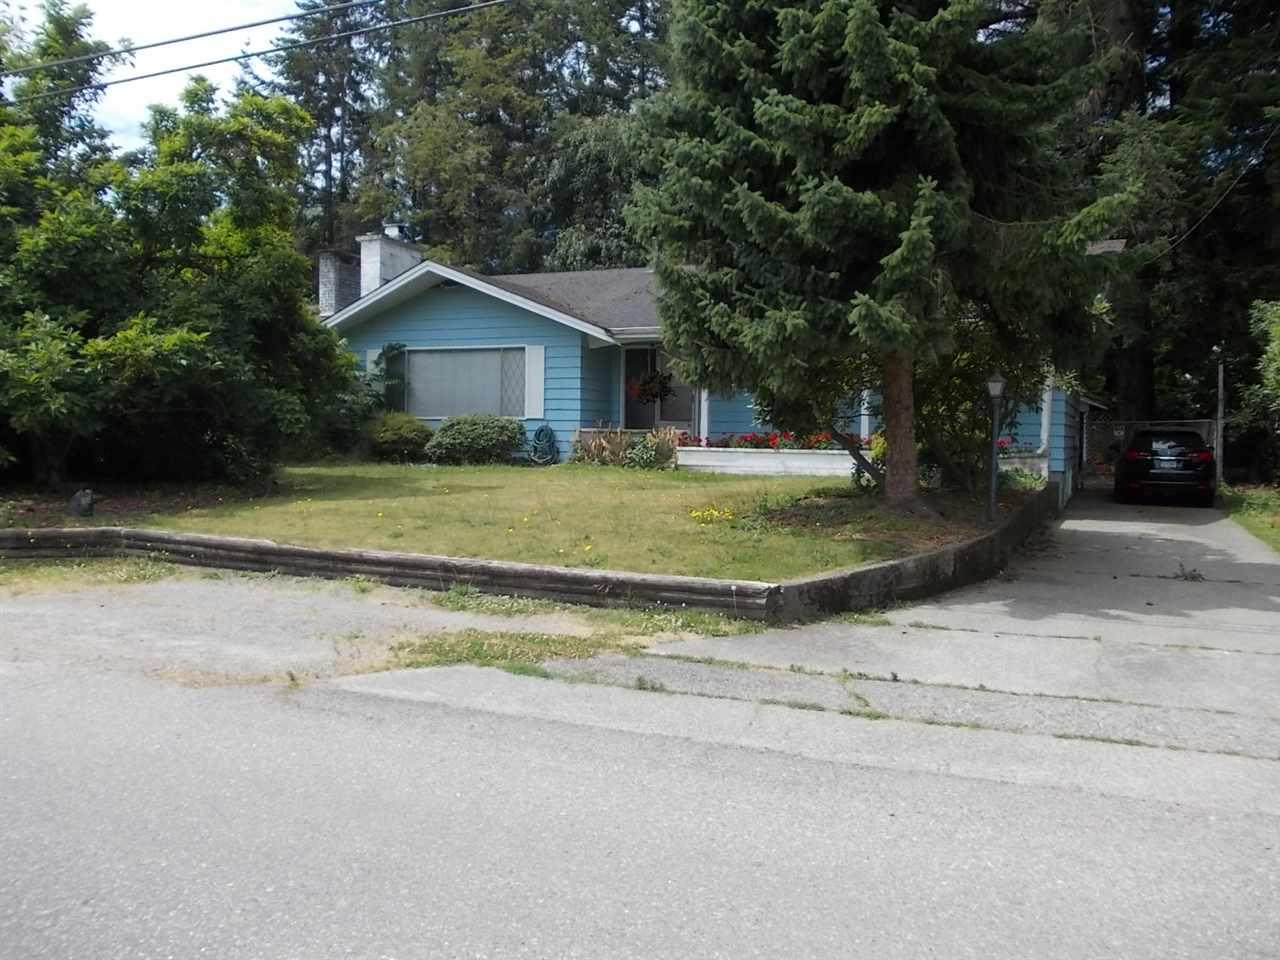 Detached at 2825 EVERGREEN STREET, Abbotsford, British Columbia. Image 1